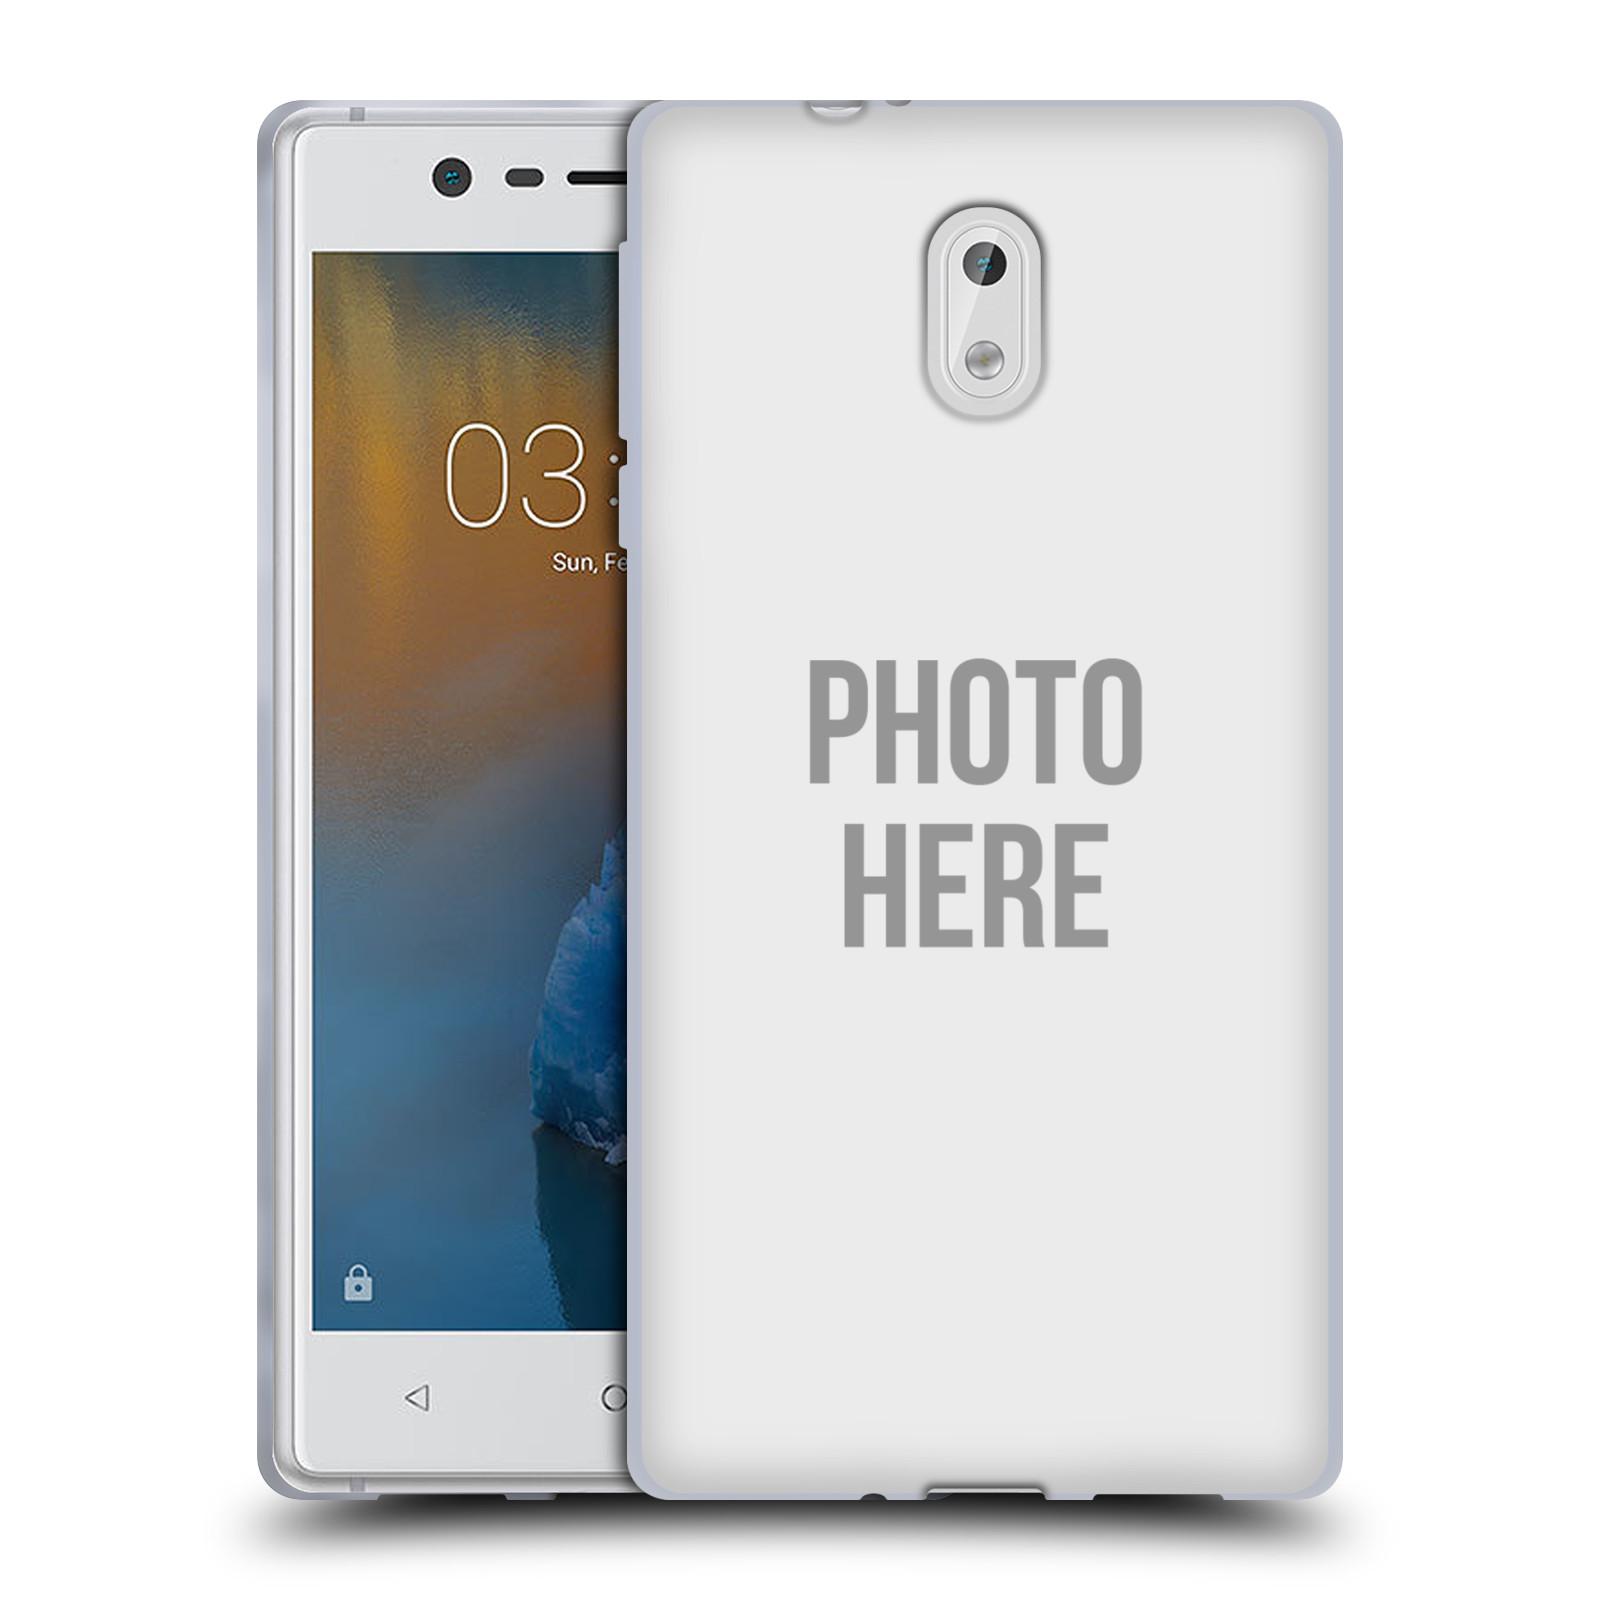 Silikonové pouzdro na mobil Nokia 3 Head Case - s vlastním motivem